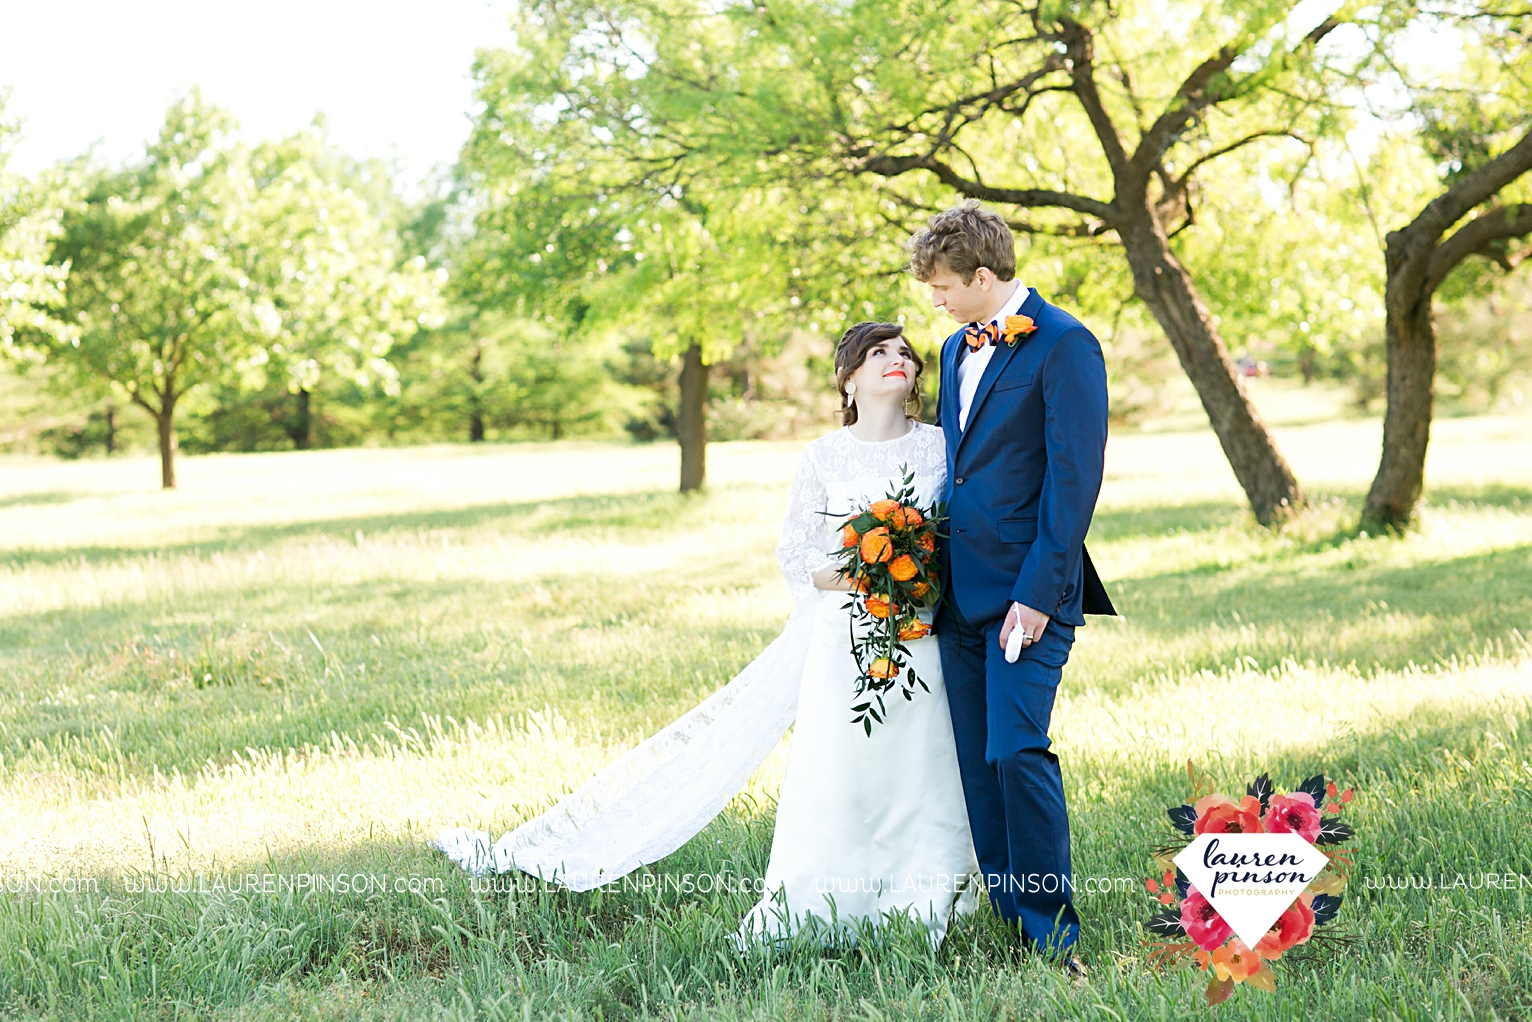 wichita-falls-texas-wedding-photographer-vintage-off-beat-bride-faith-village-church-of-christ-the-plex-roller-skating_2428.jpg